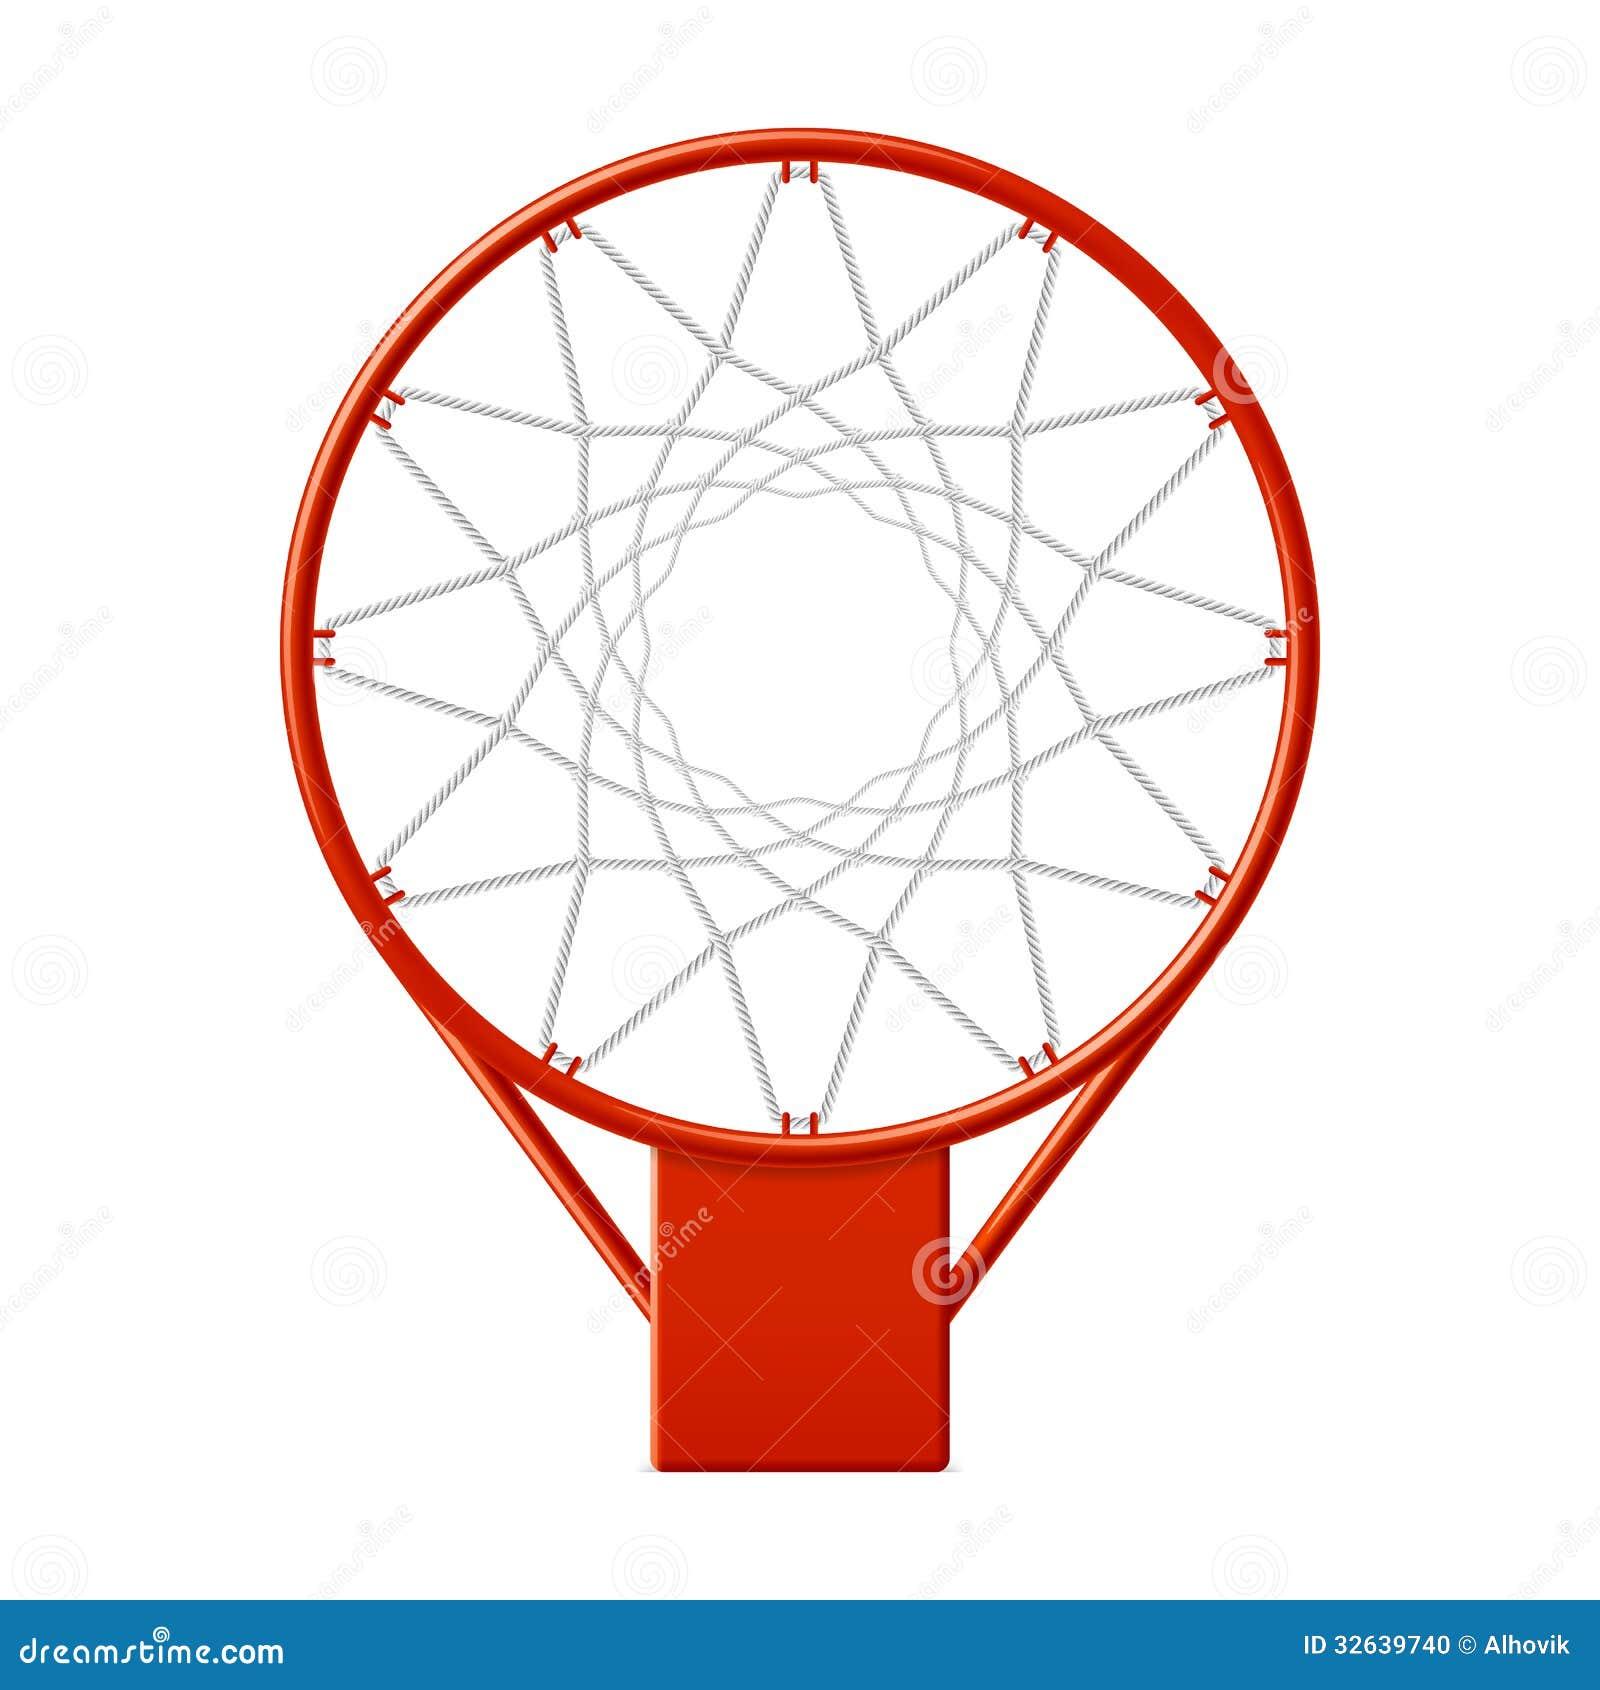 Basketball hoop stock vector. Image of basket, equipment ...